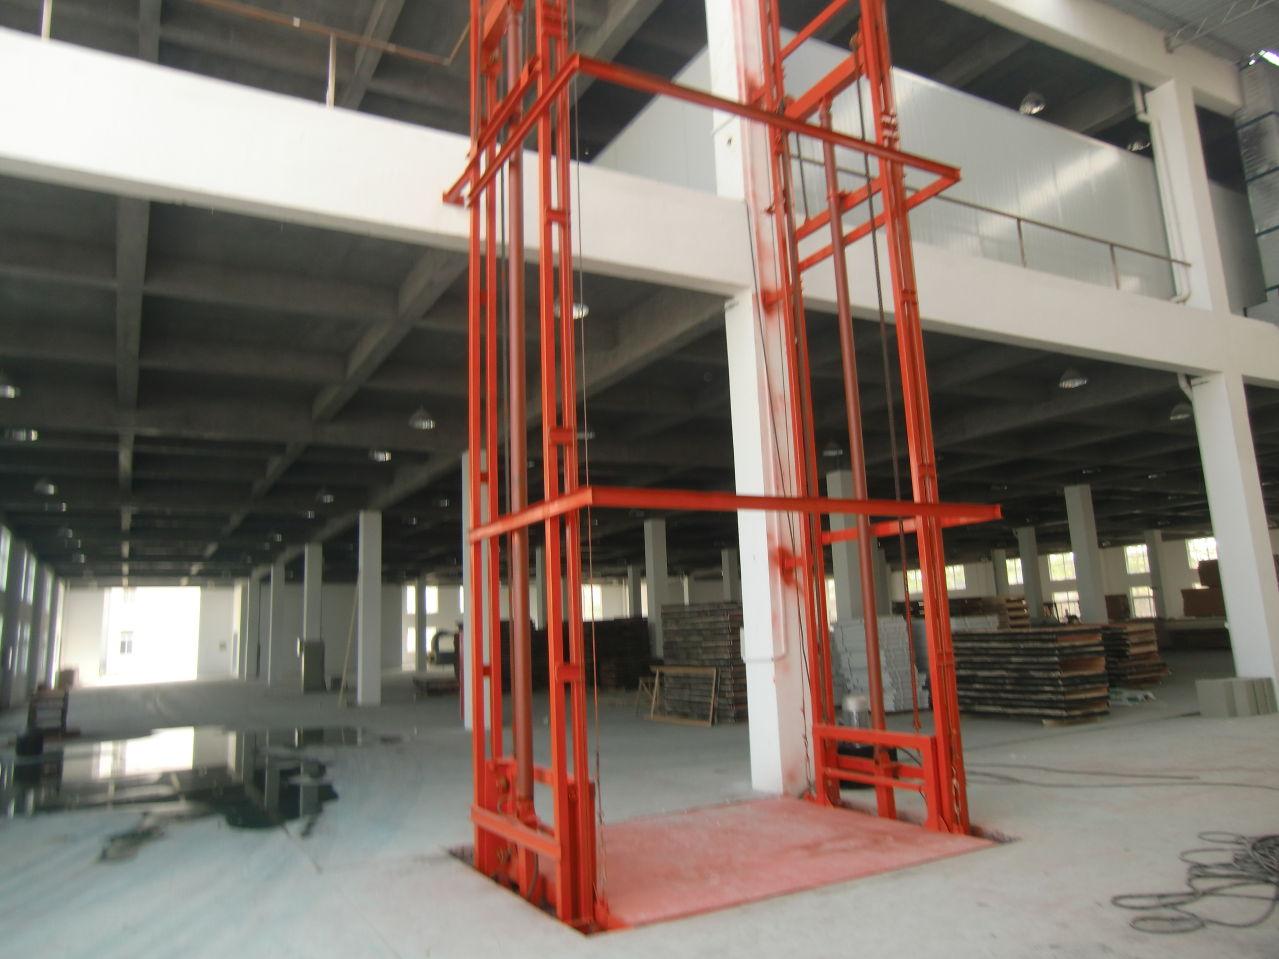 construction building lifting equipment